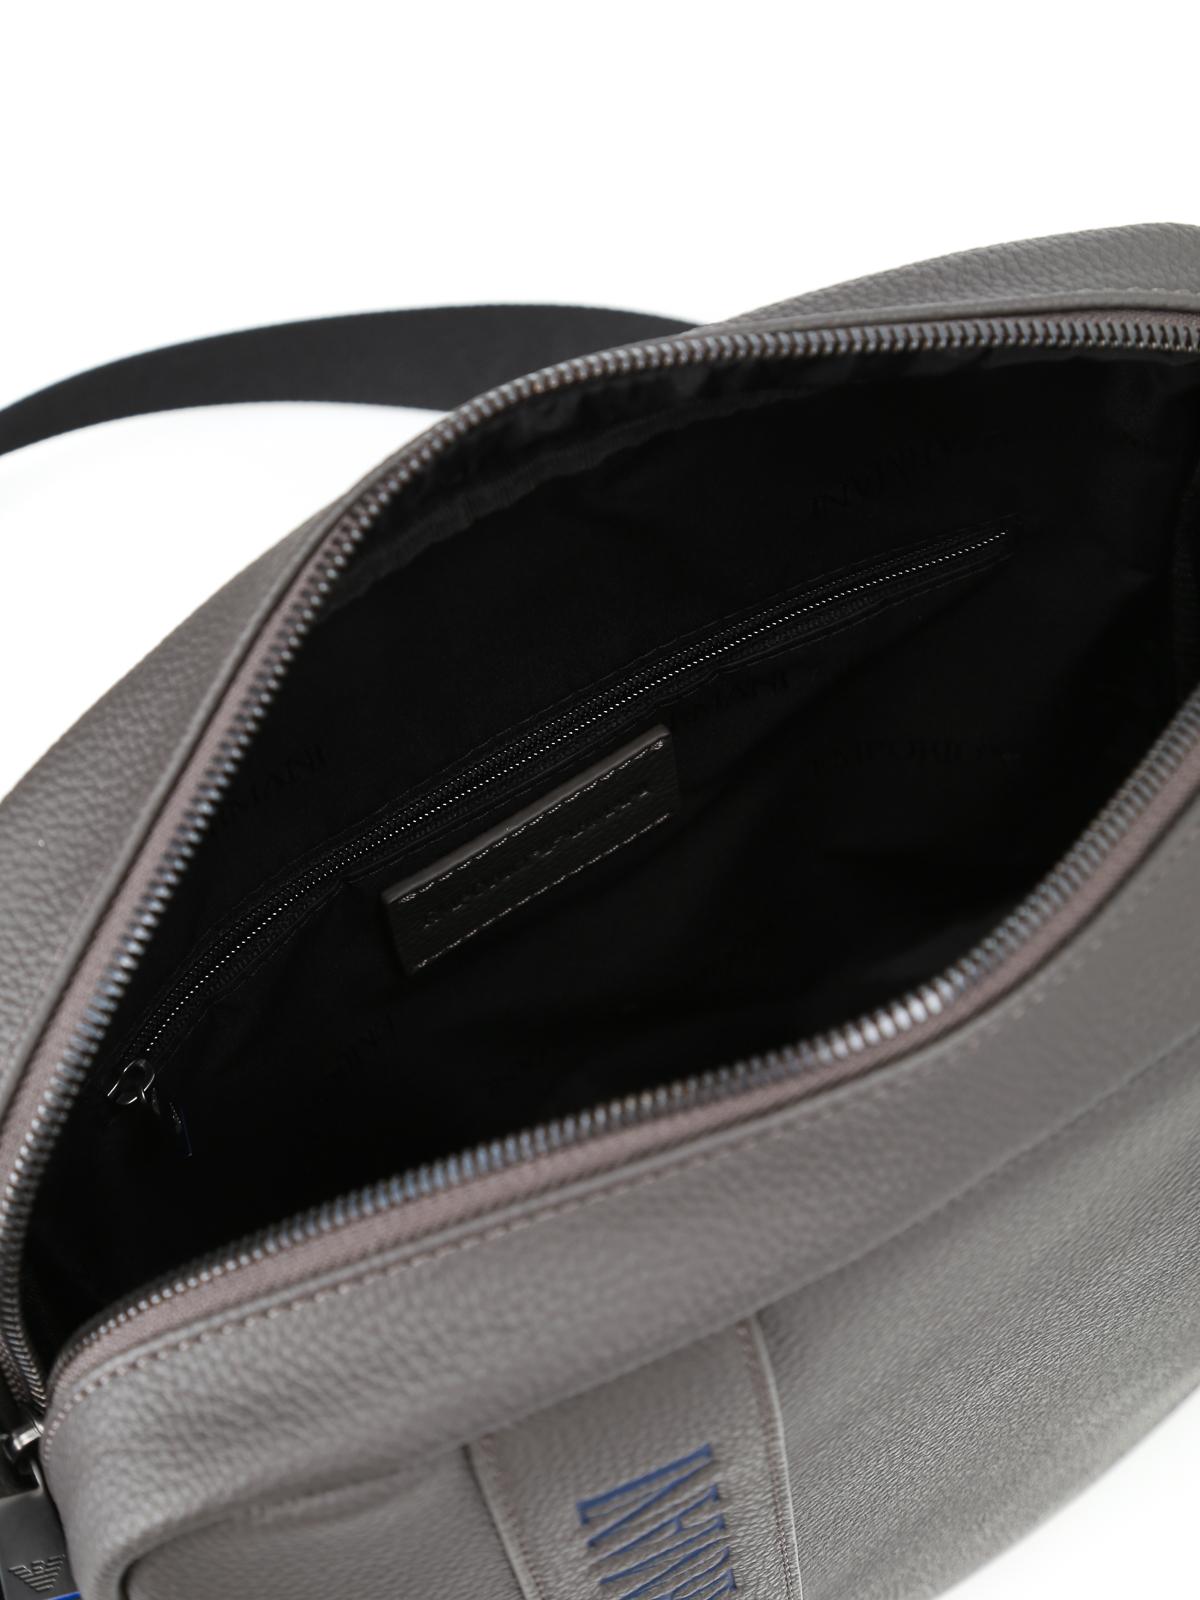 d5ee1c25aeb9 EMPORIO ARMANI buy online Embossed logo faux leather bag · EMPORIO ARMANI  cross  body bags ...